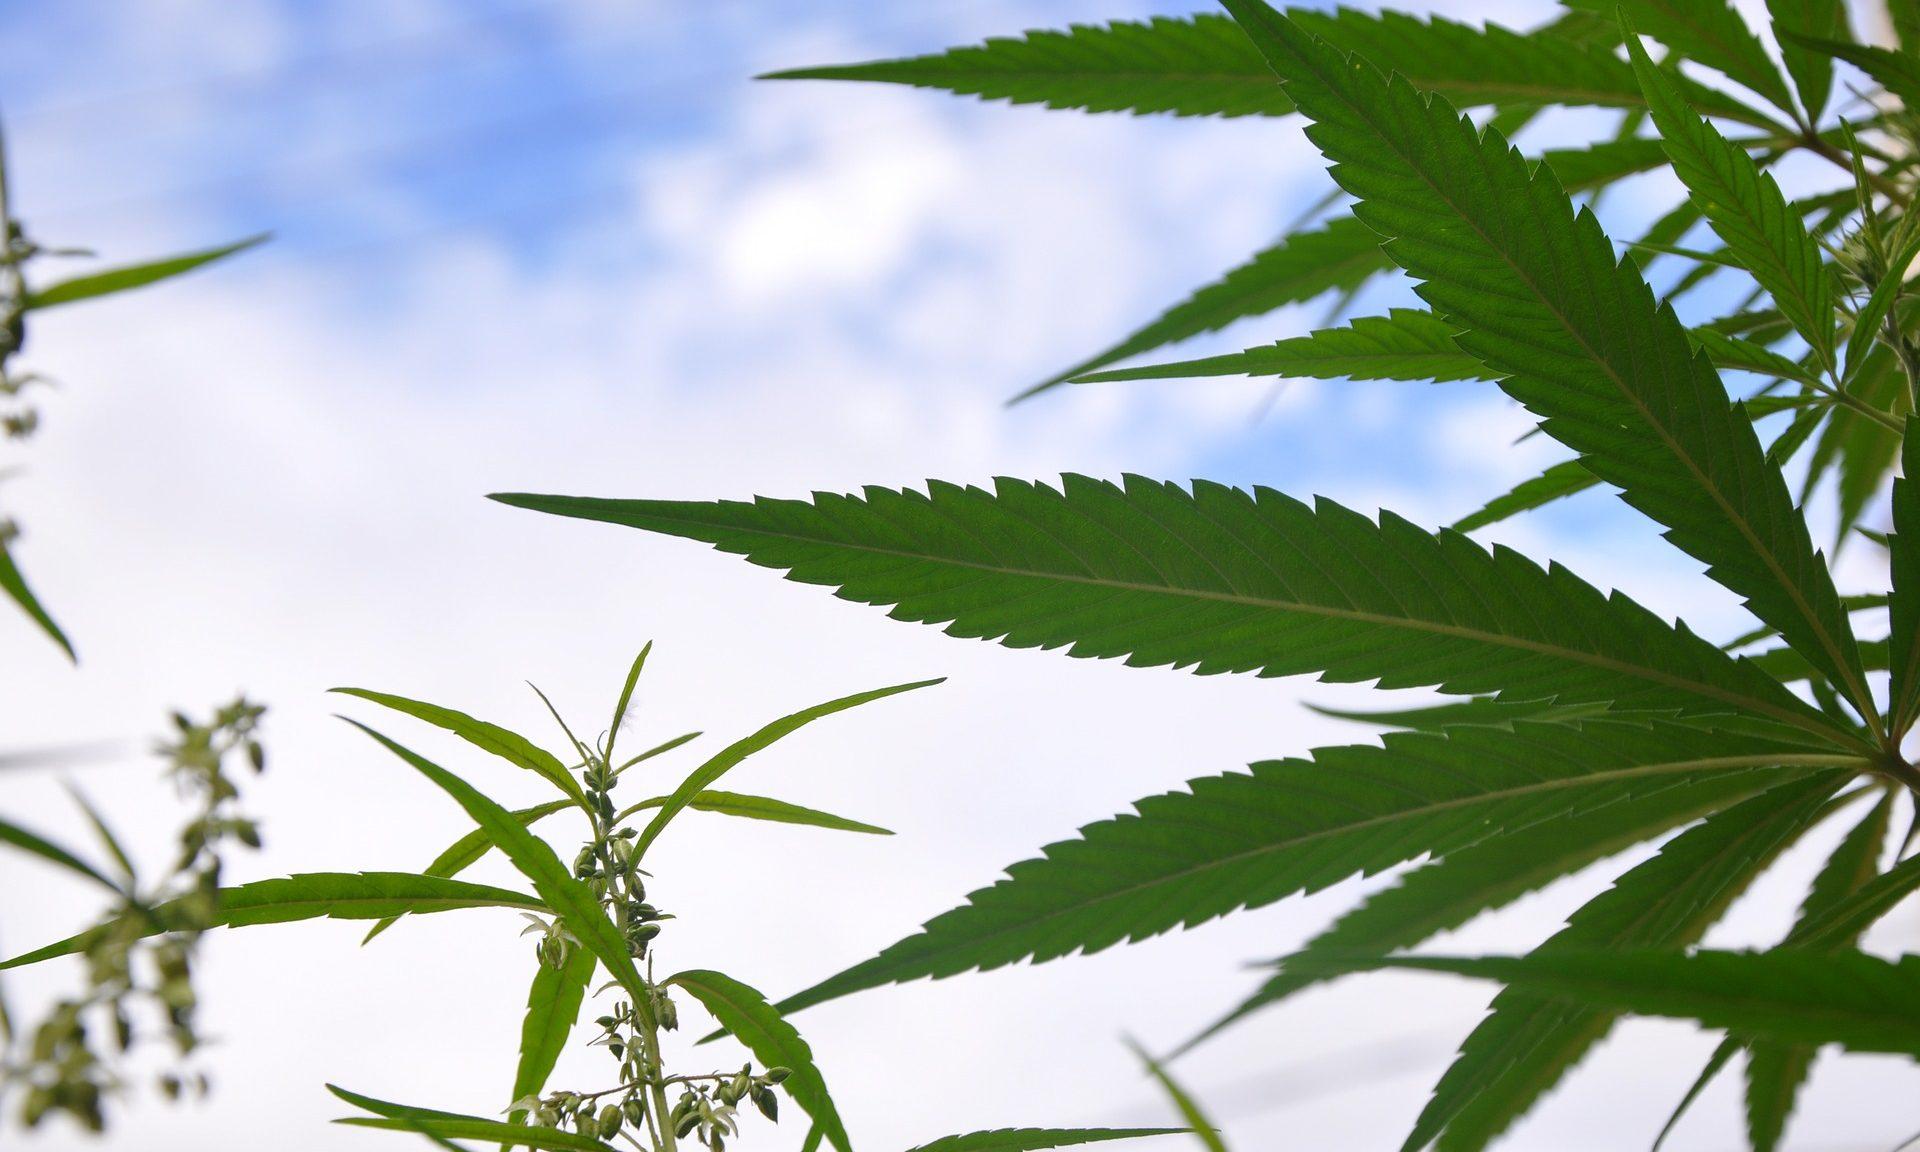 MaxPixel.freegreatpicture.com-Grass-Plant-Marijuana-Nature-Leaf-Hashish-3364697-e1549572889614